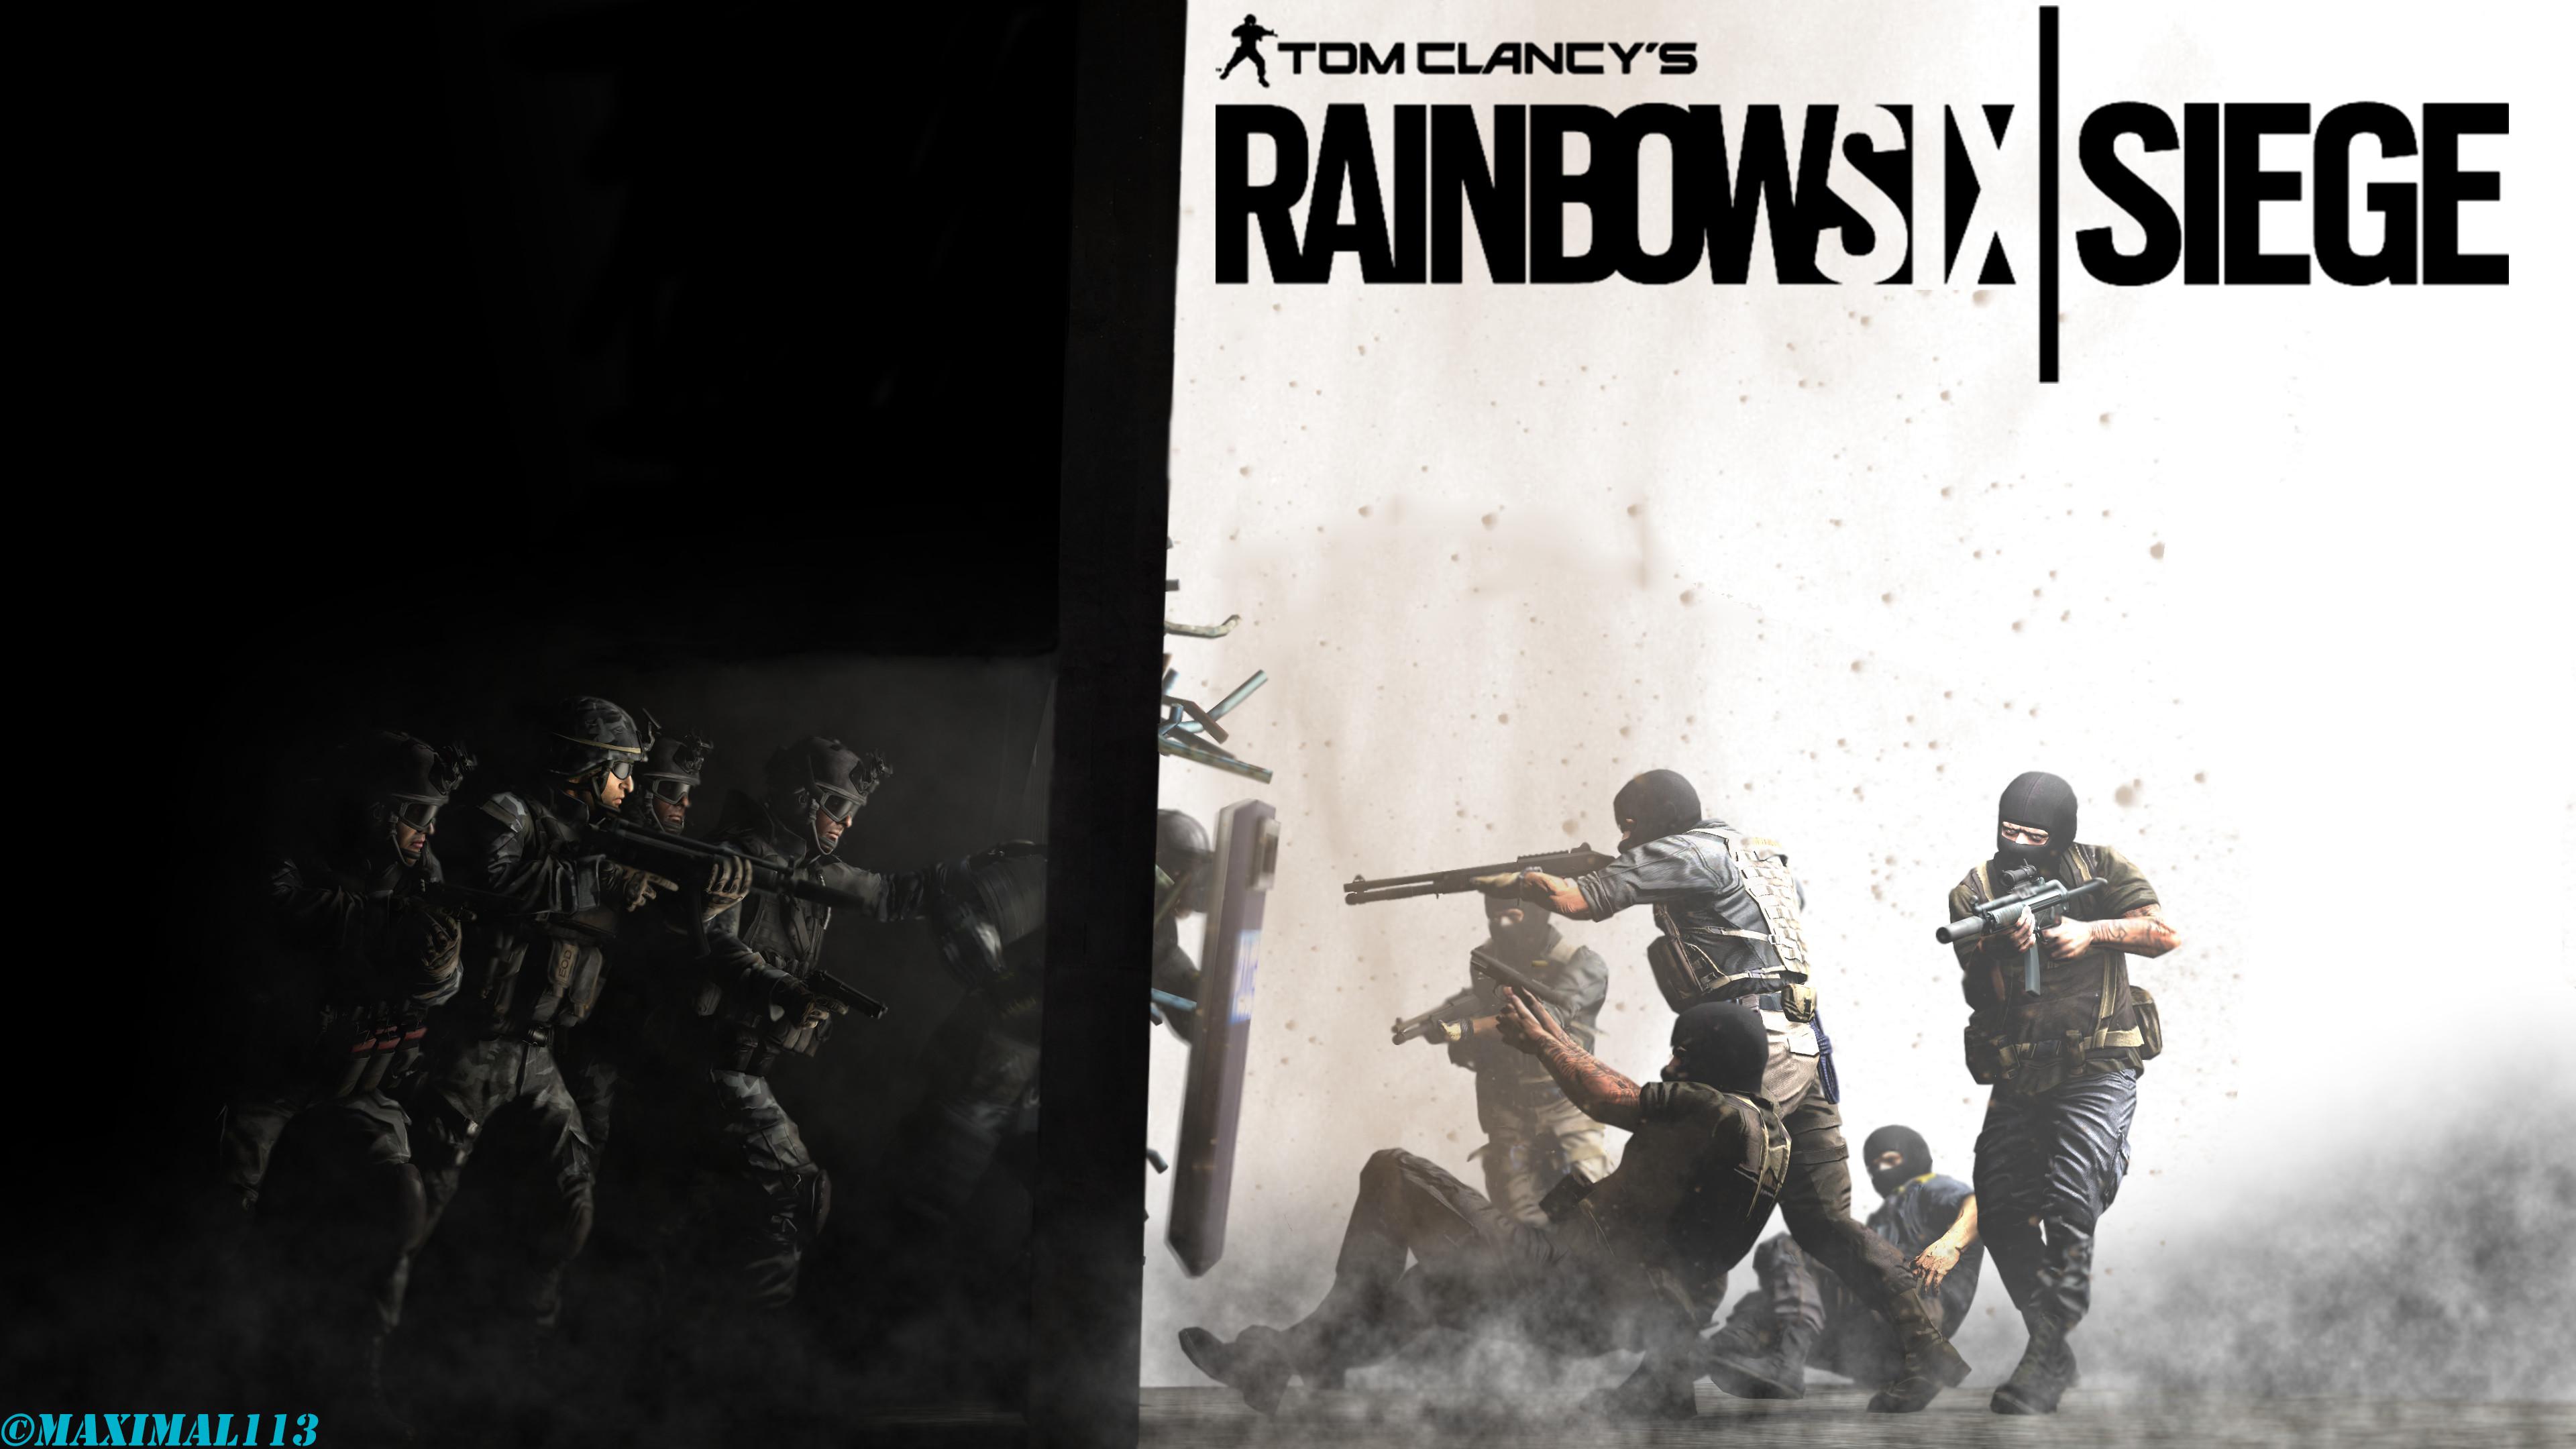 Tom clancys rainbow six wallpapers wallpapertag - Rainbow six siege phone ...